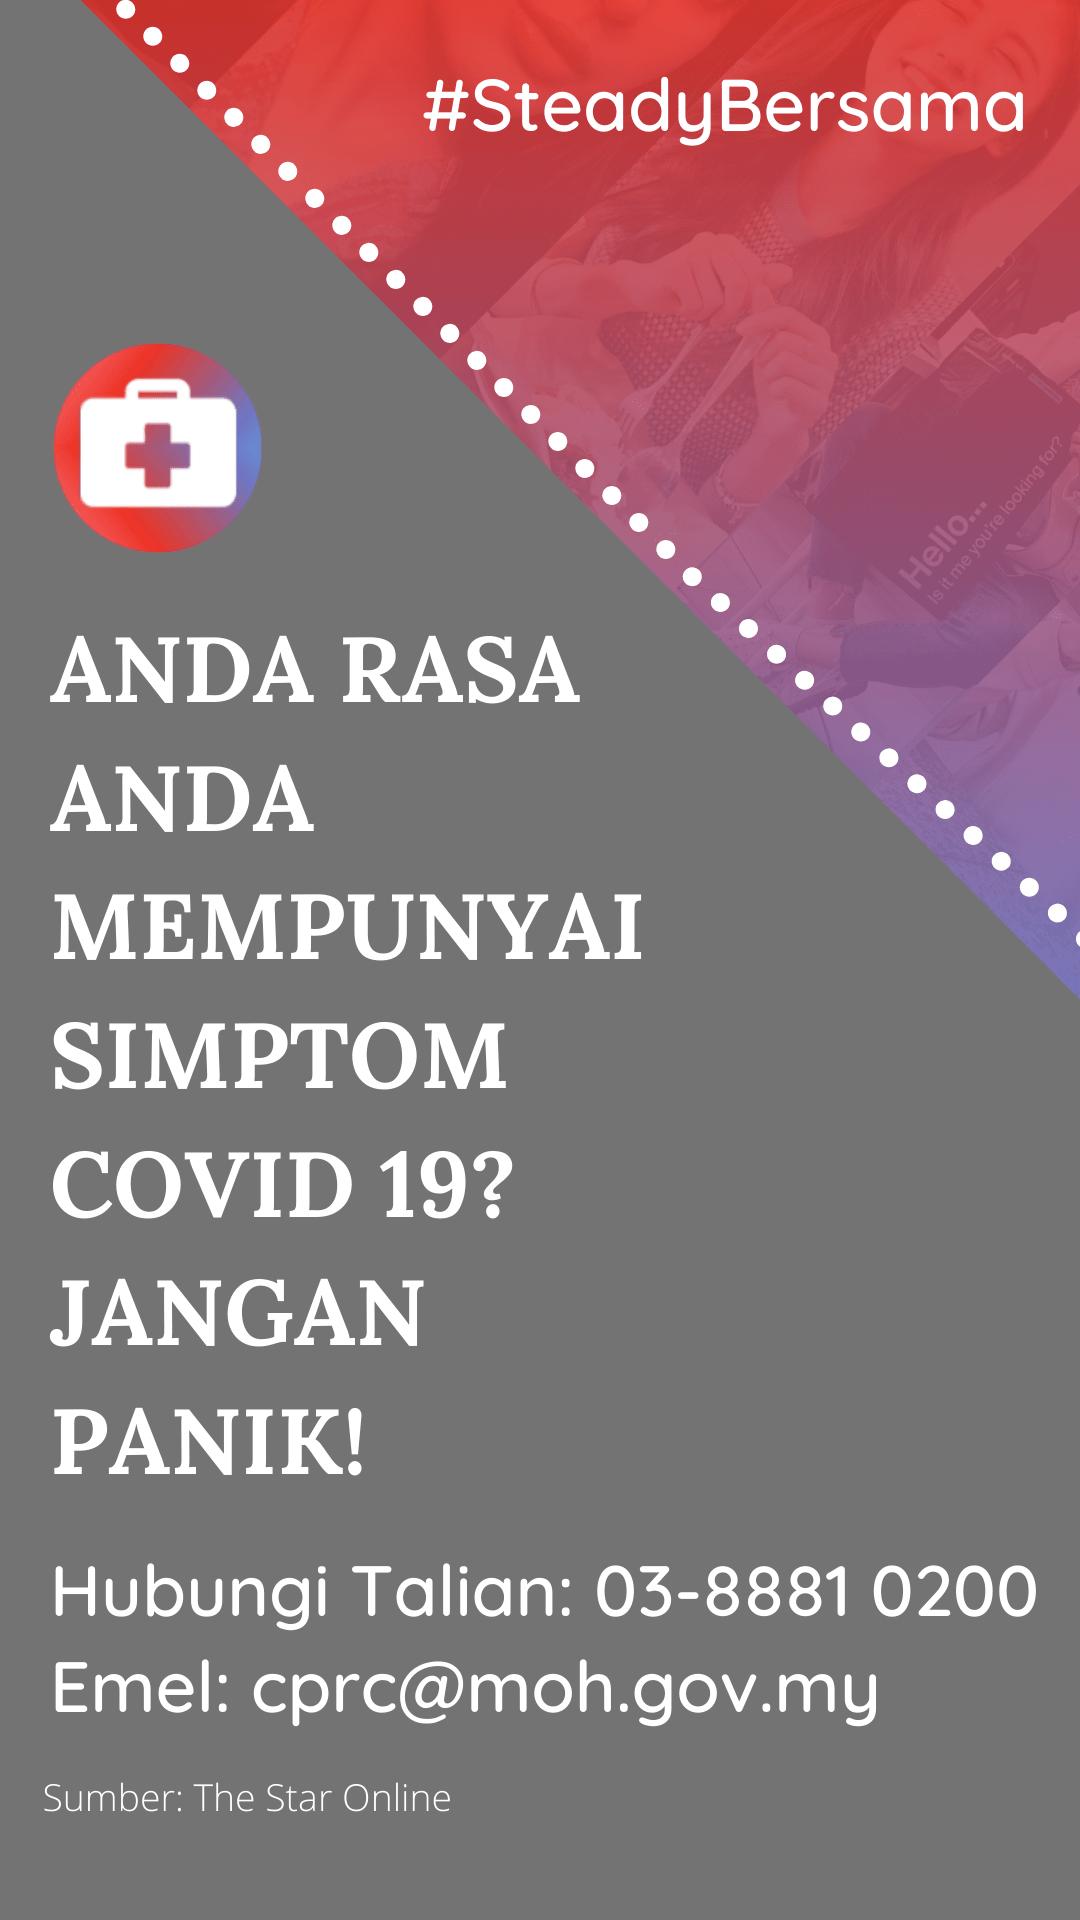 Material - SushiVid+Covid+19+Aid+-+hotline+(Malay)